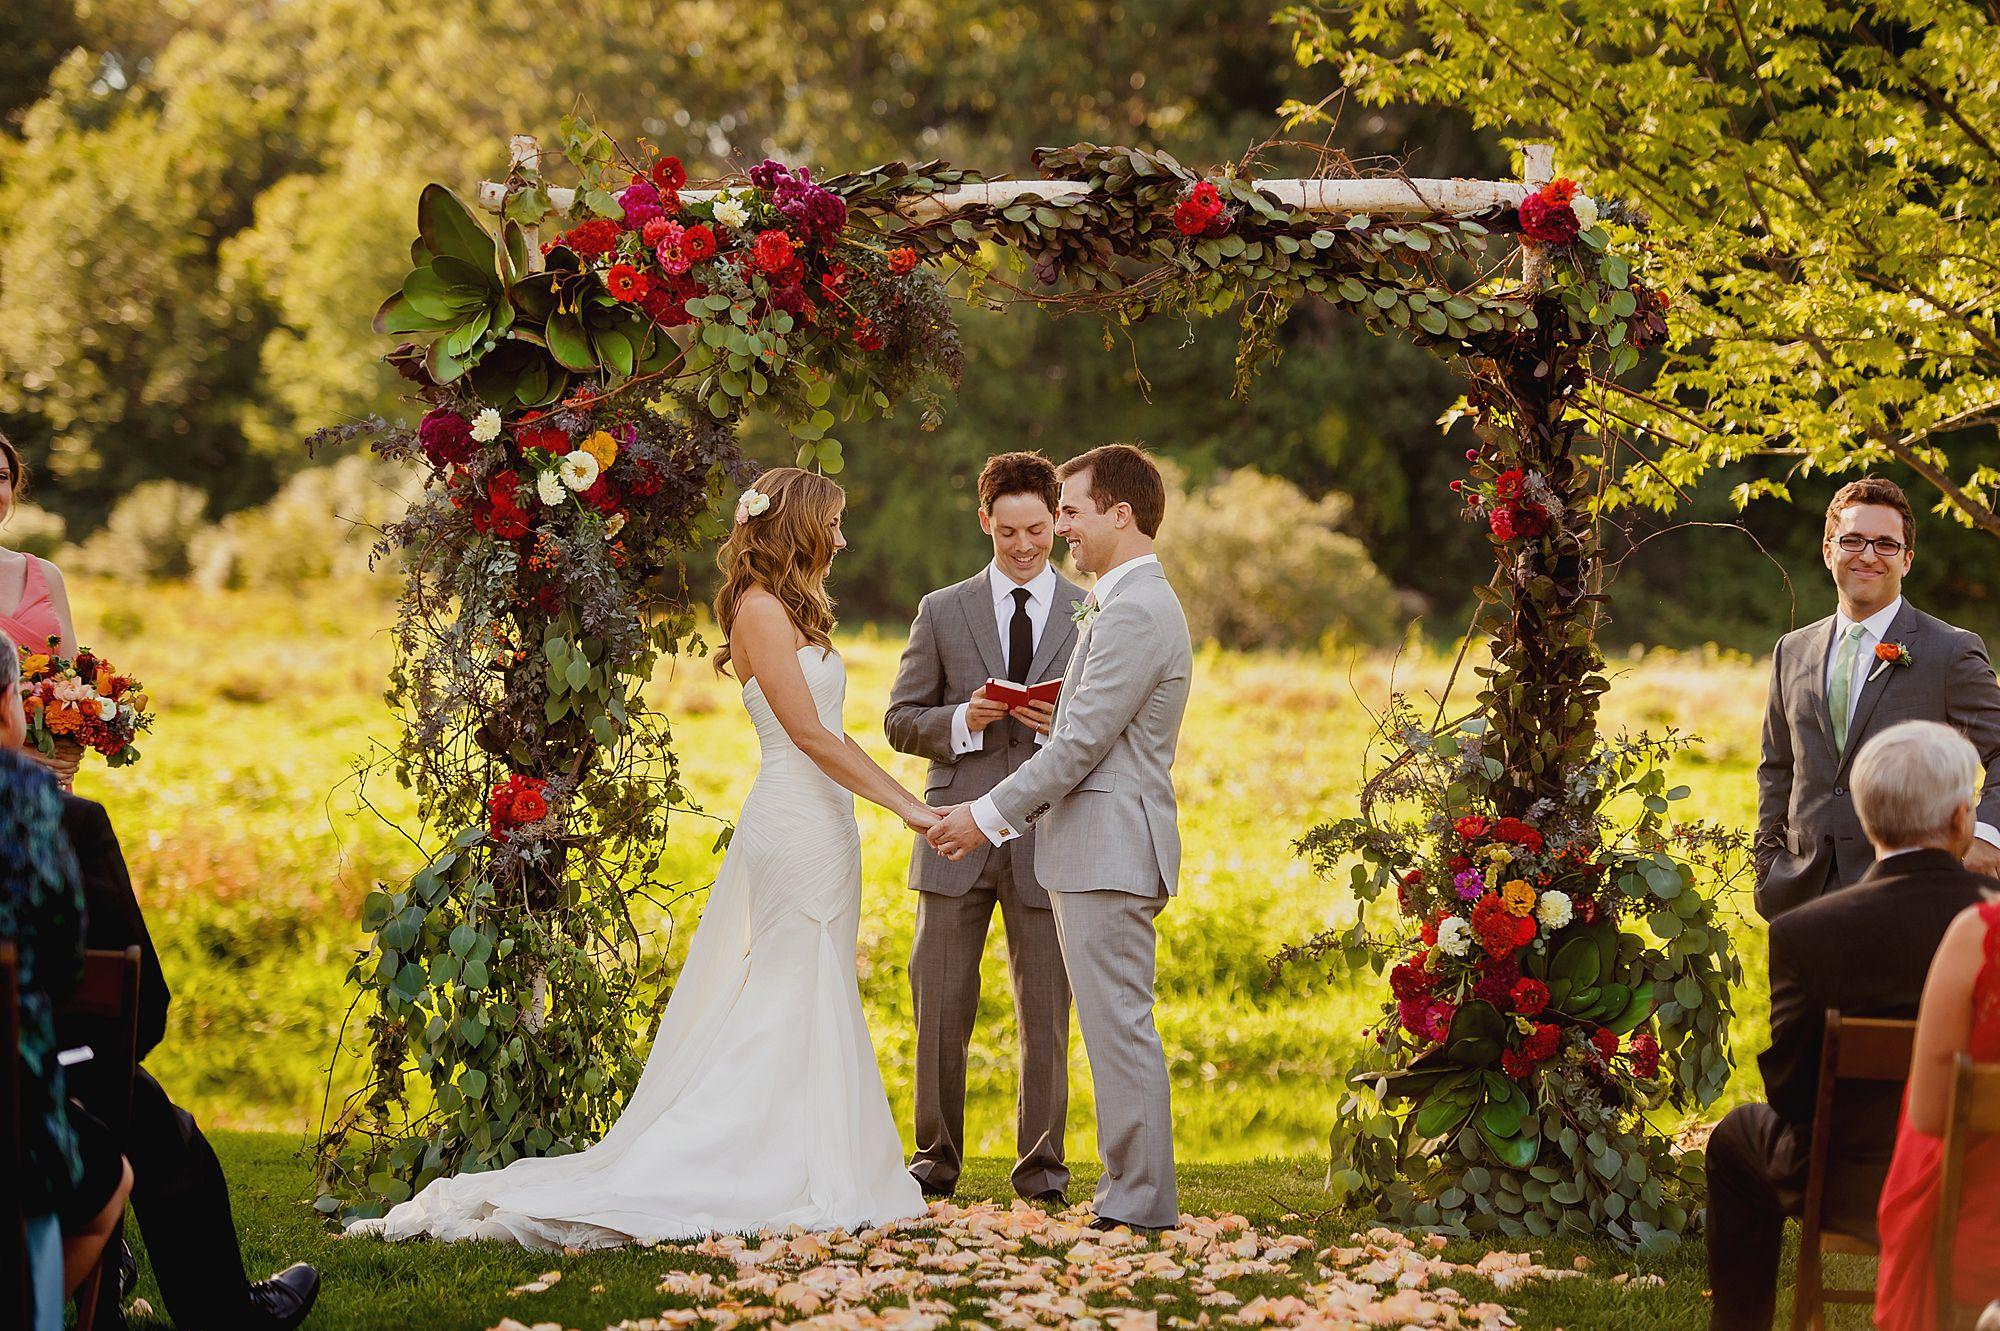 A Rustic Farm Wedding And Tent Reception At Misty Farm In Ann